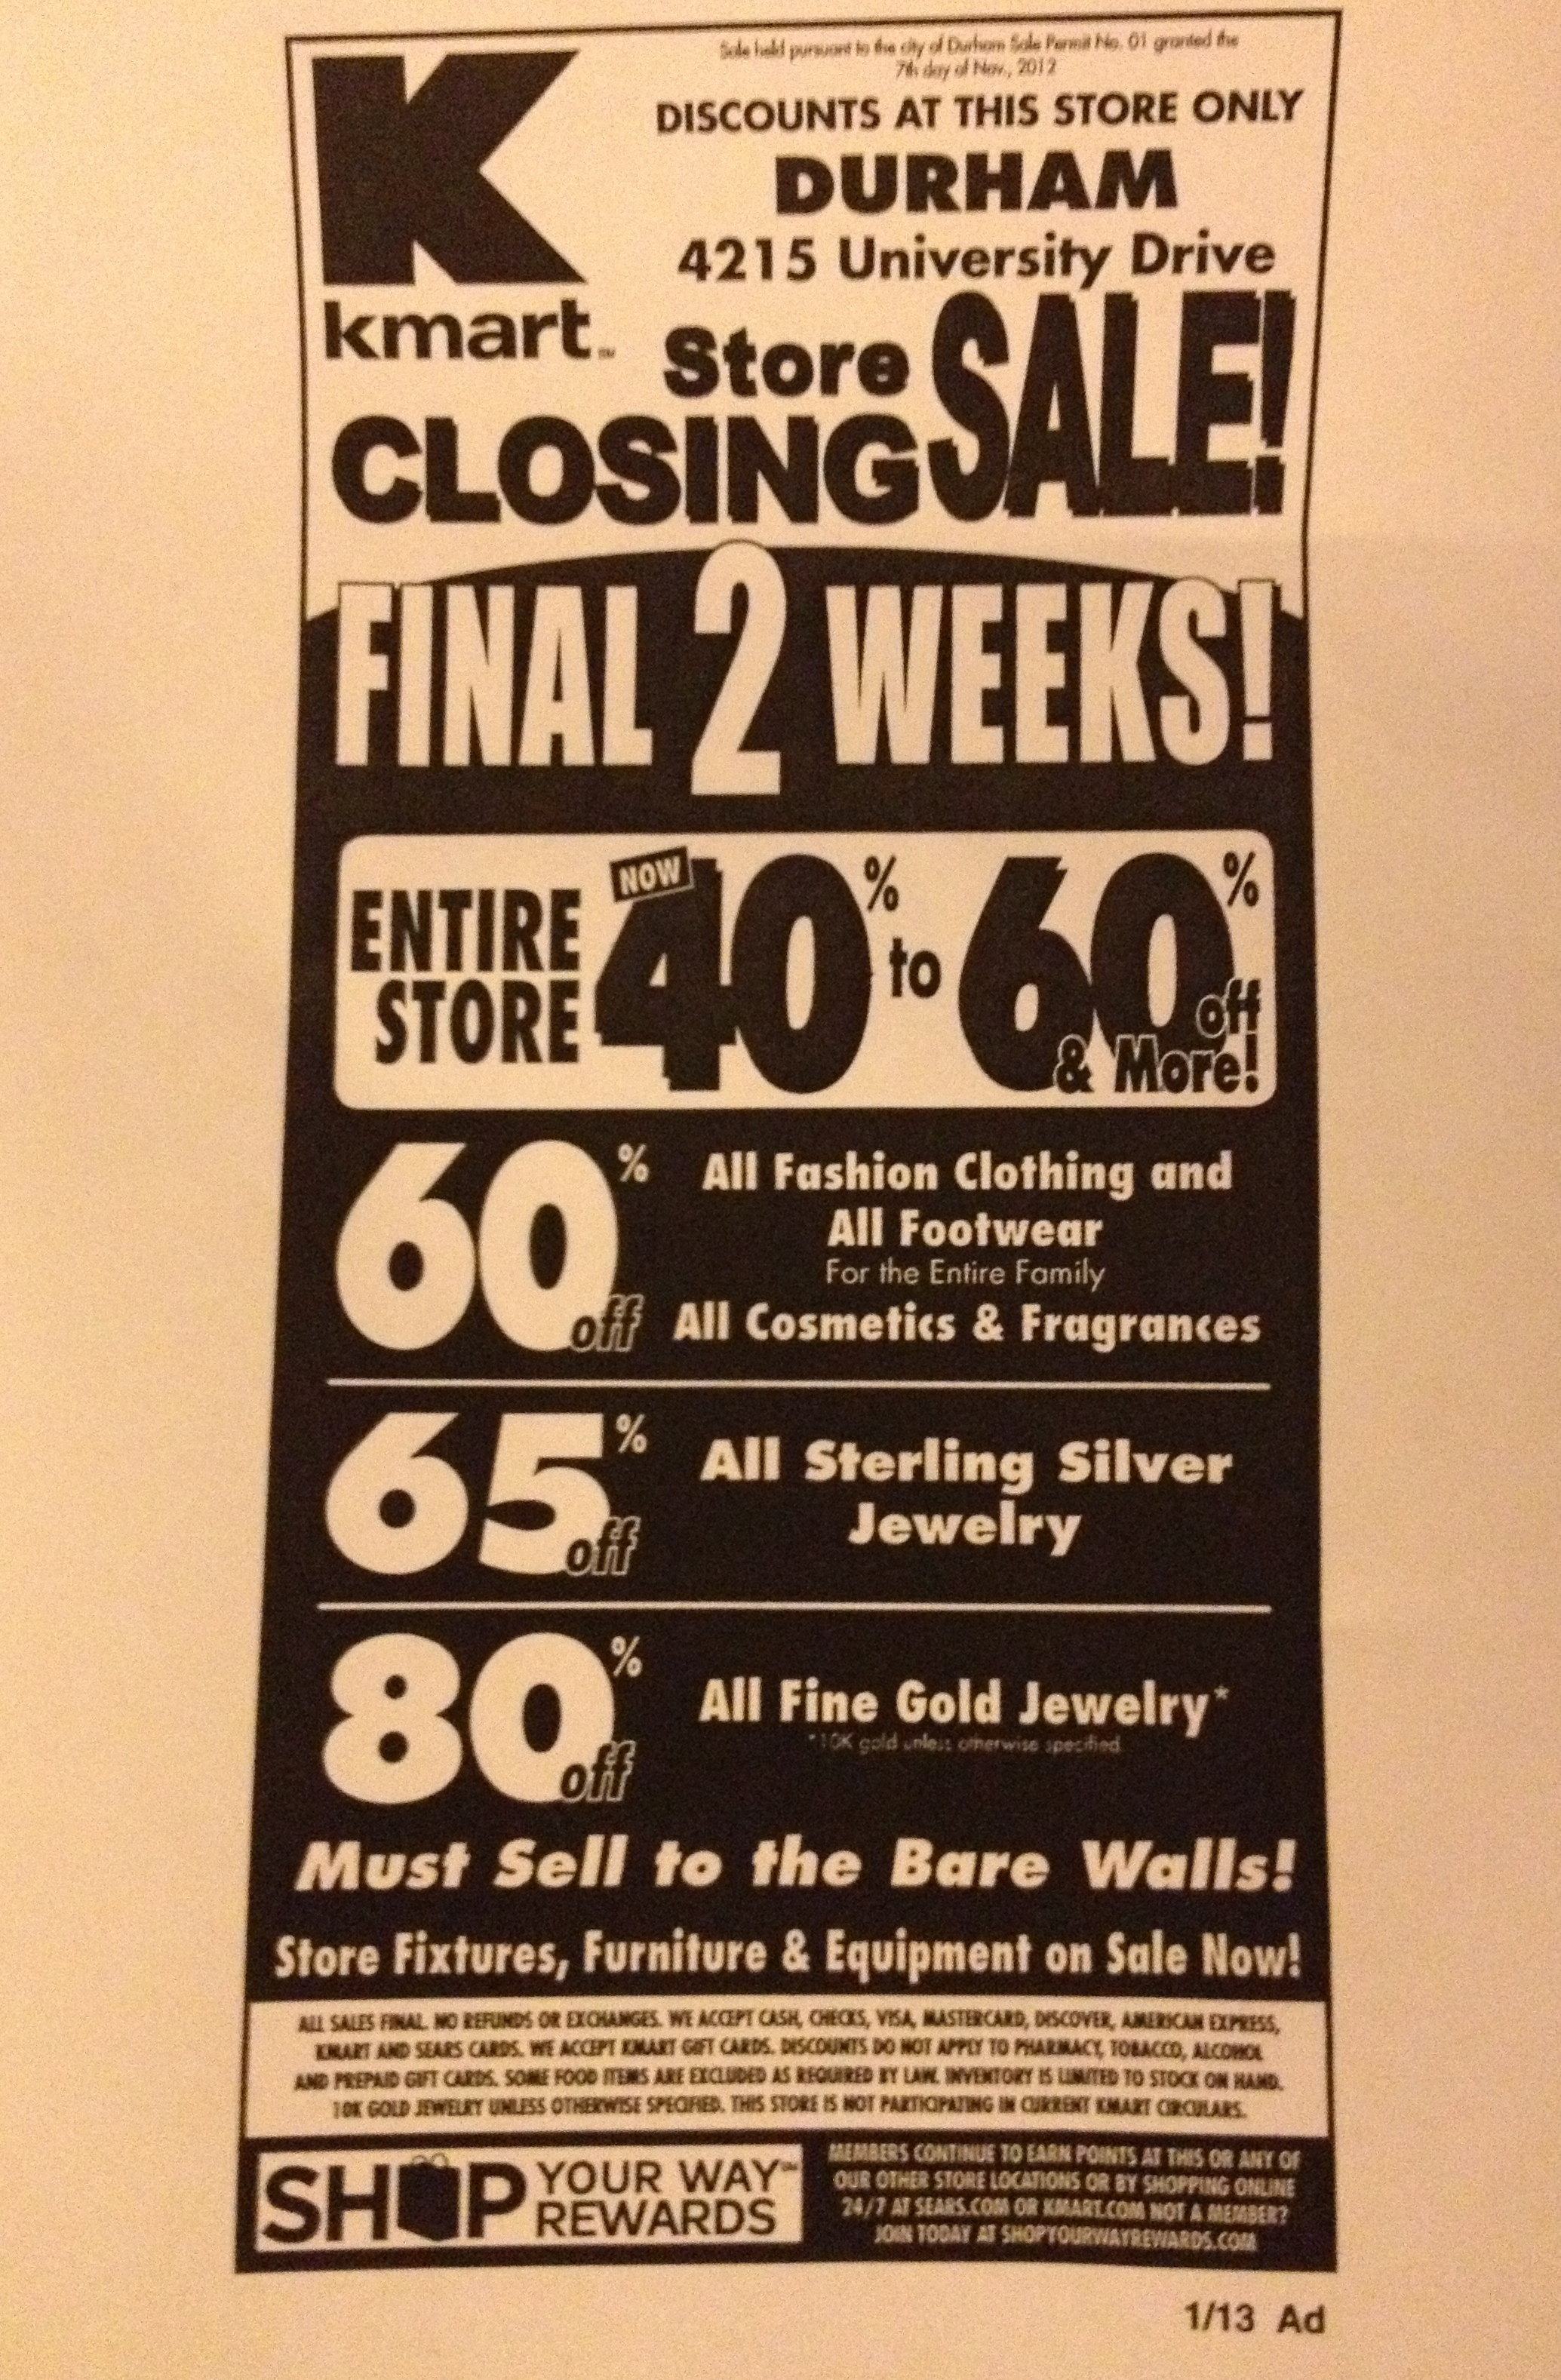 File Kmart Store Closing Flyer Durham Nc 8399856295 Jpg